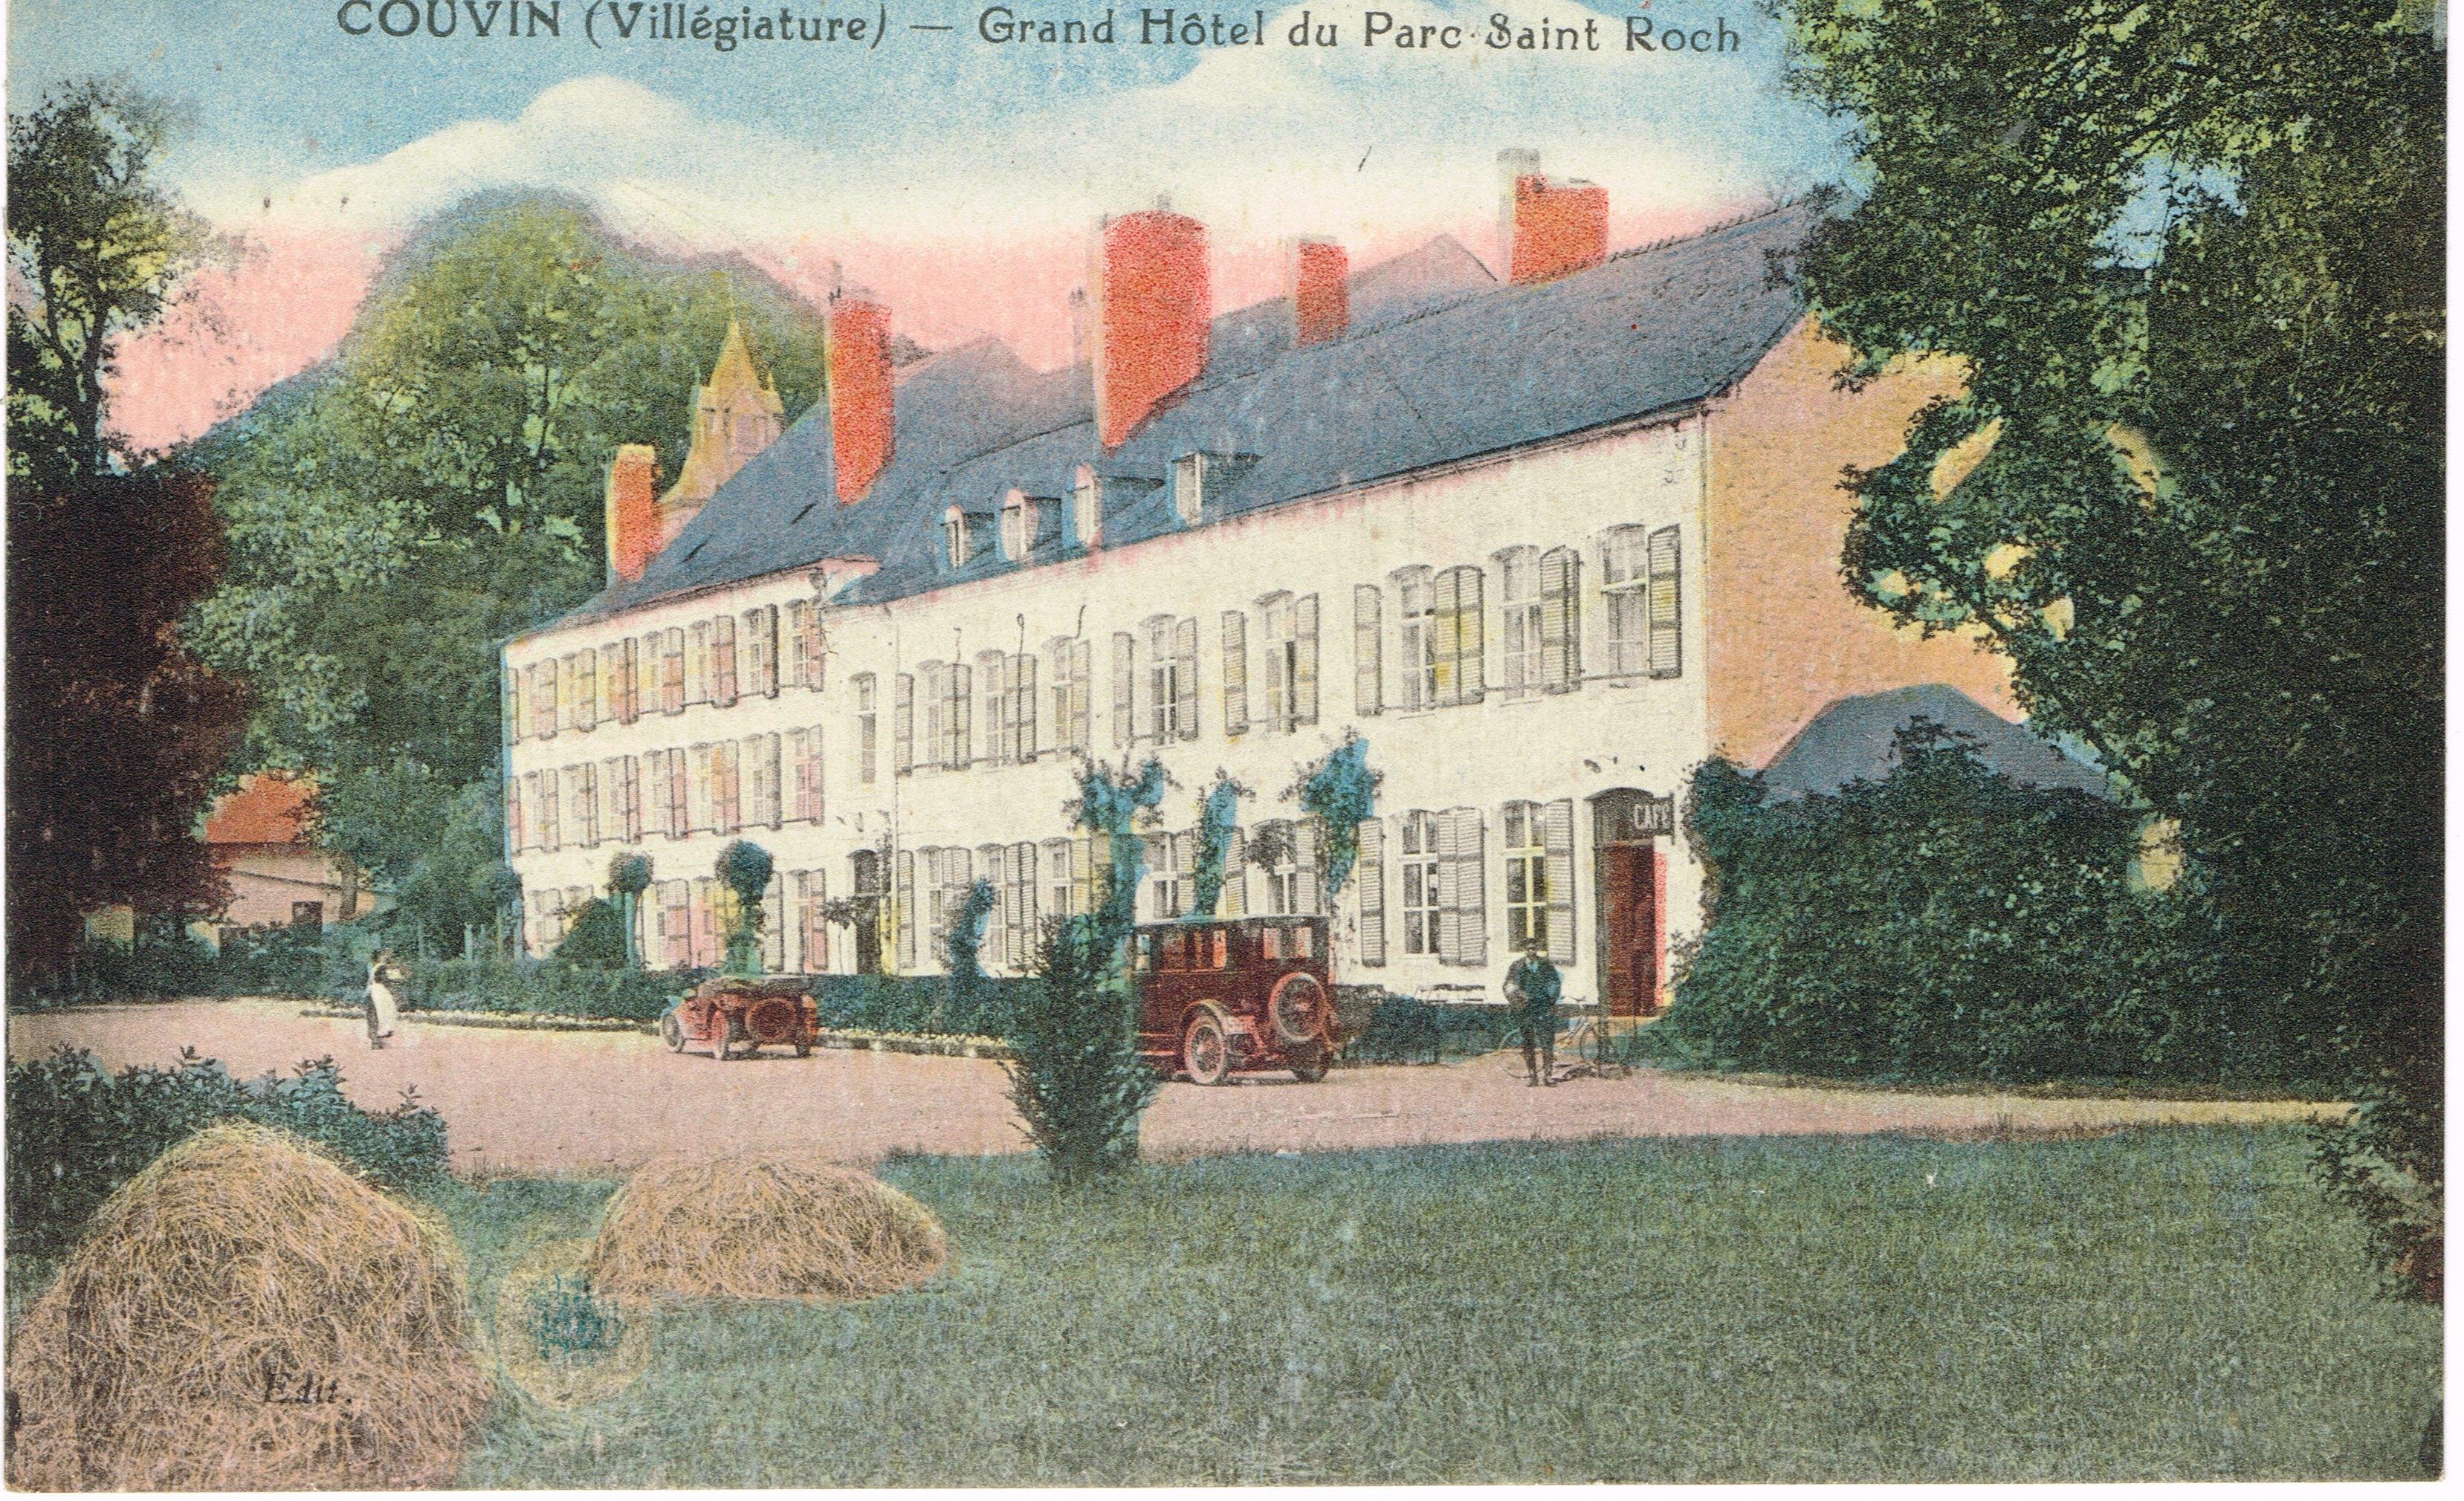 Grand Hotel Saint Roch - 1927